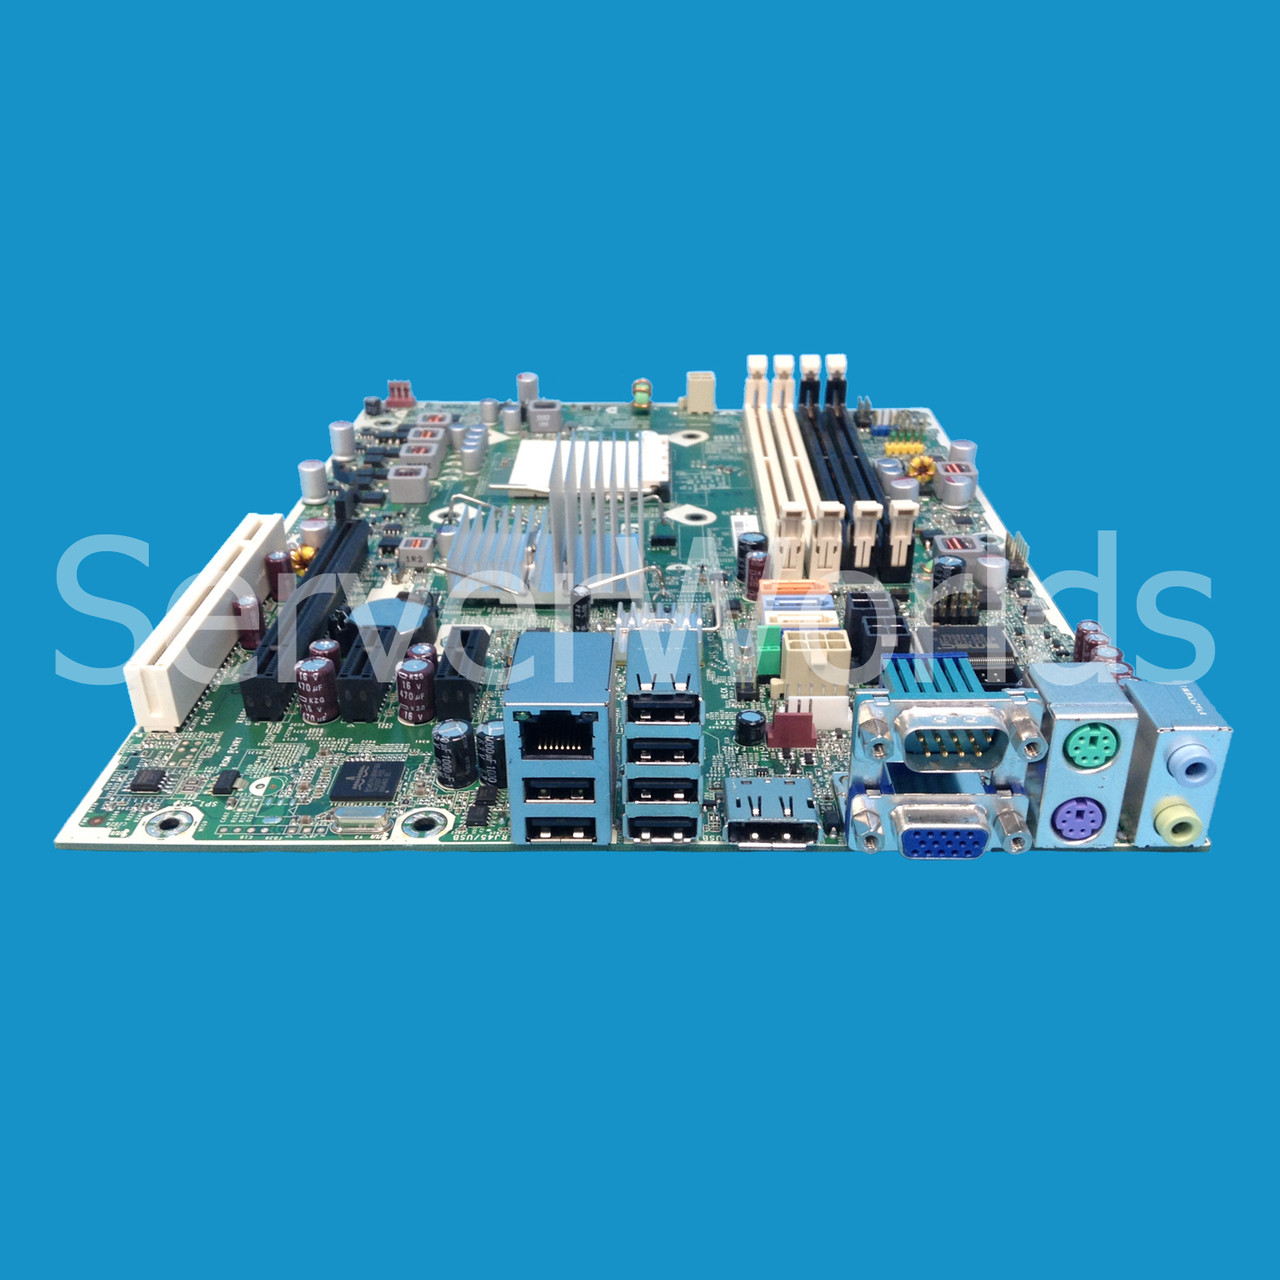 HP 531966-001 6005 SFF System Board 503336-000, 503335-001